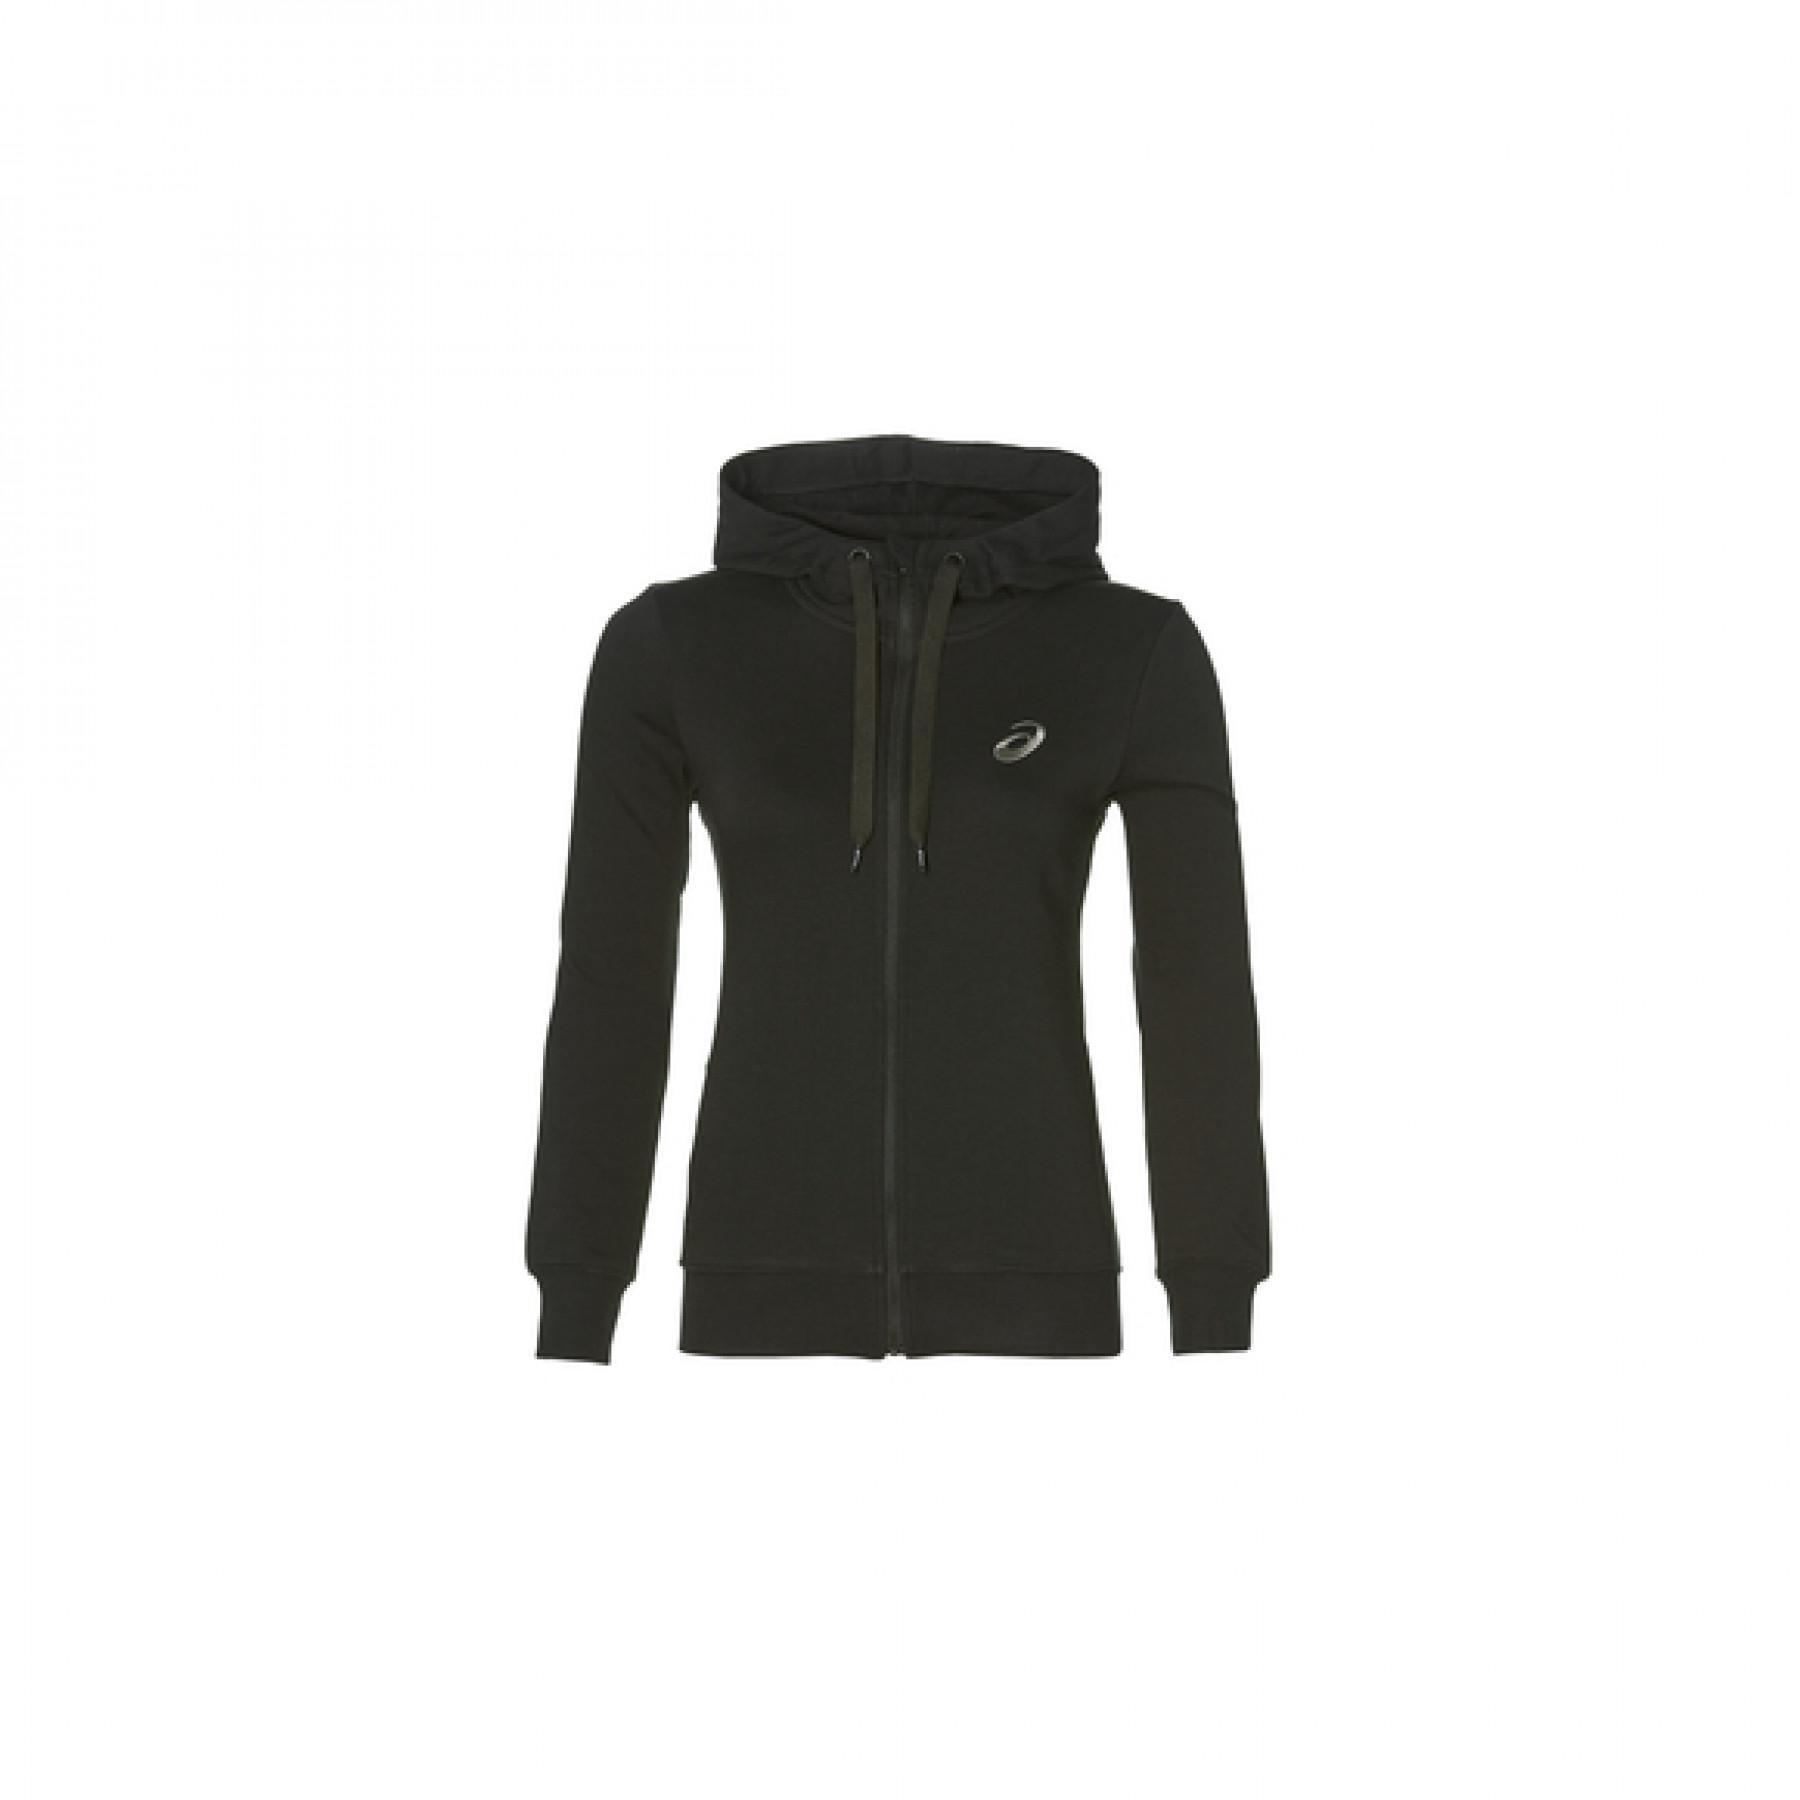 Hooded sweatshirt woman Asics chest logo fz